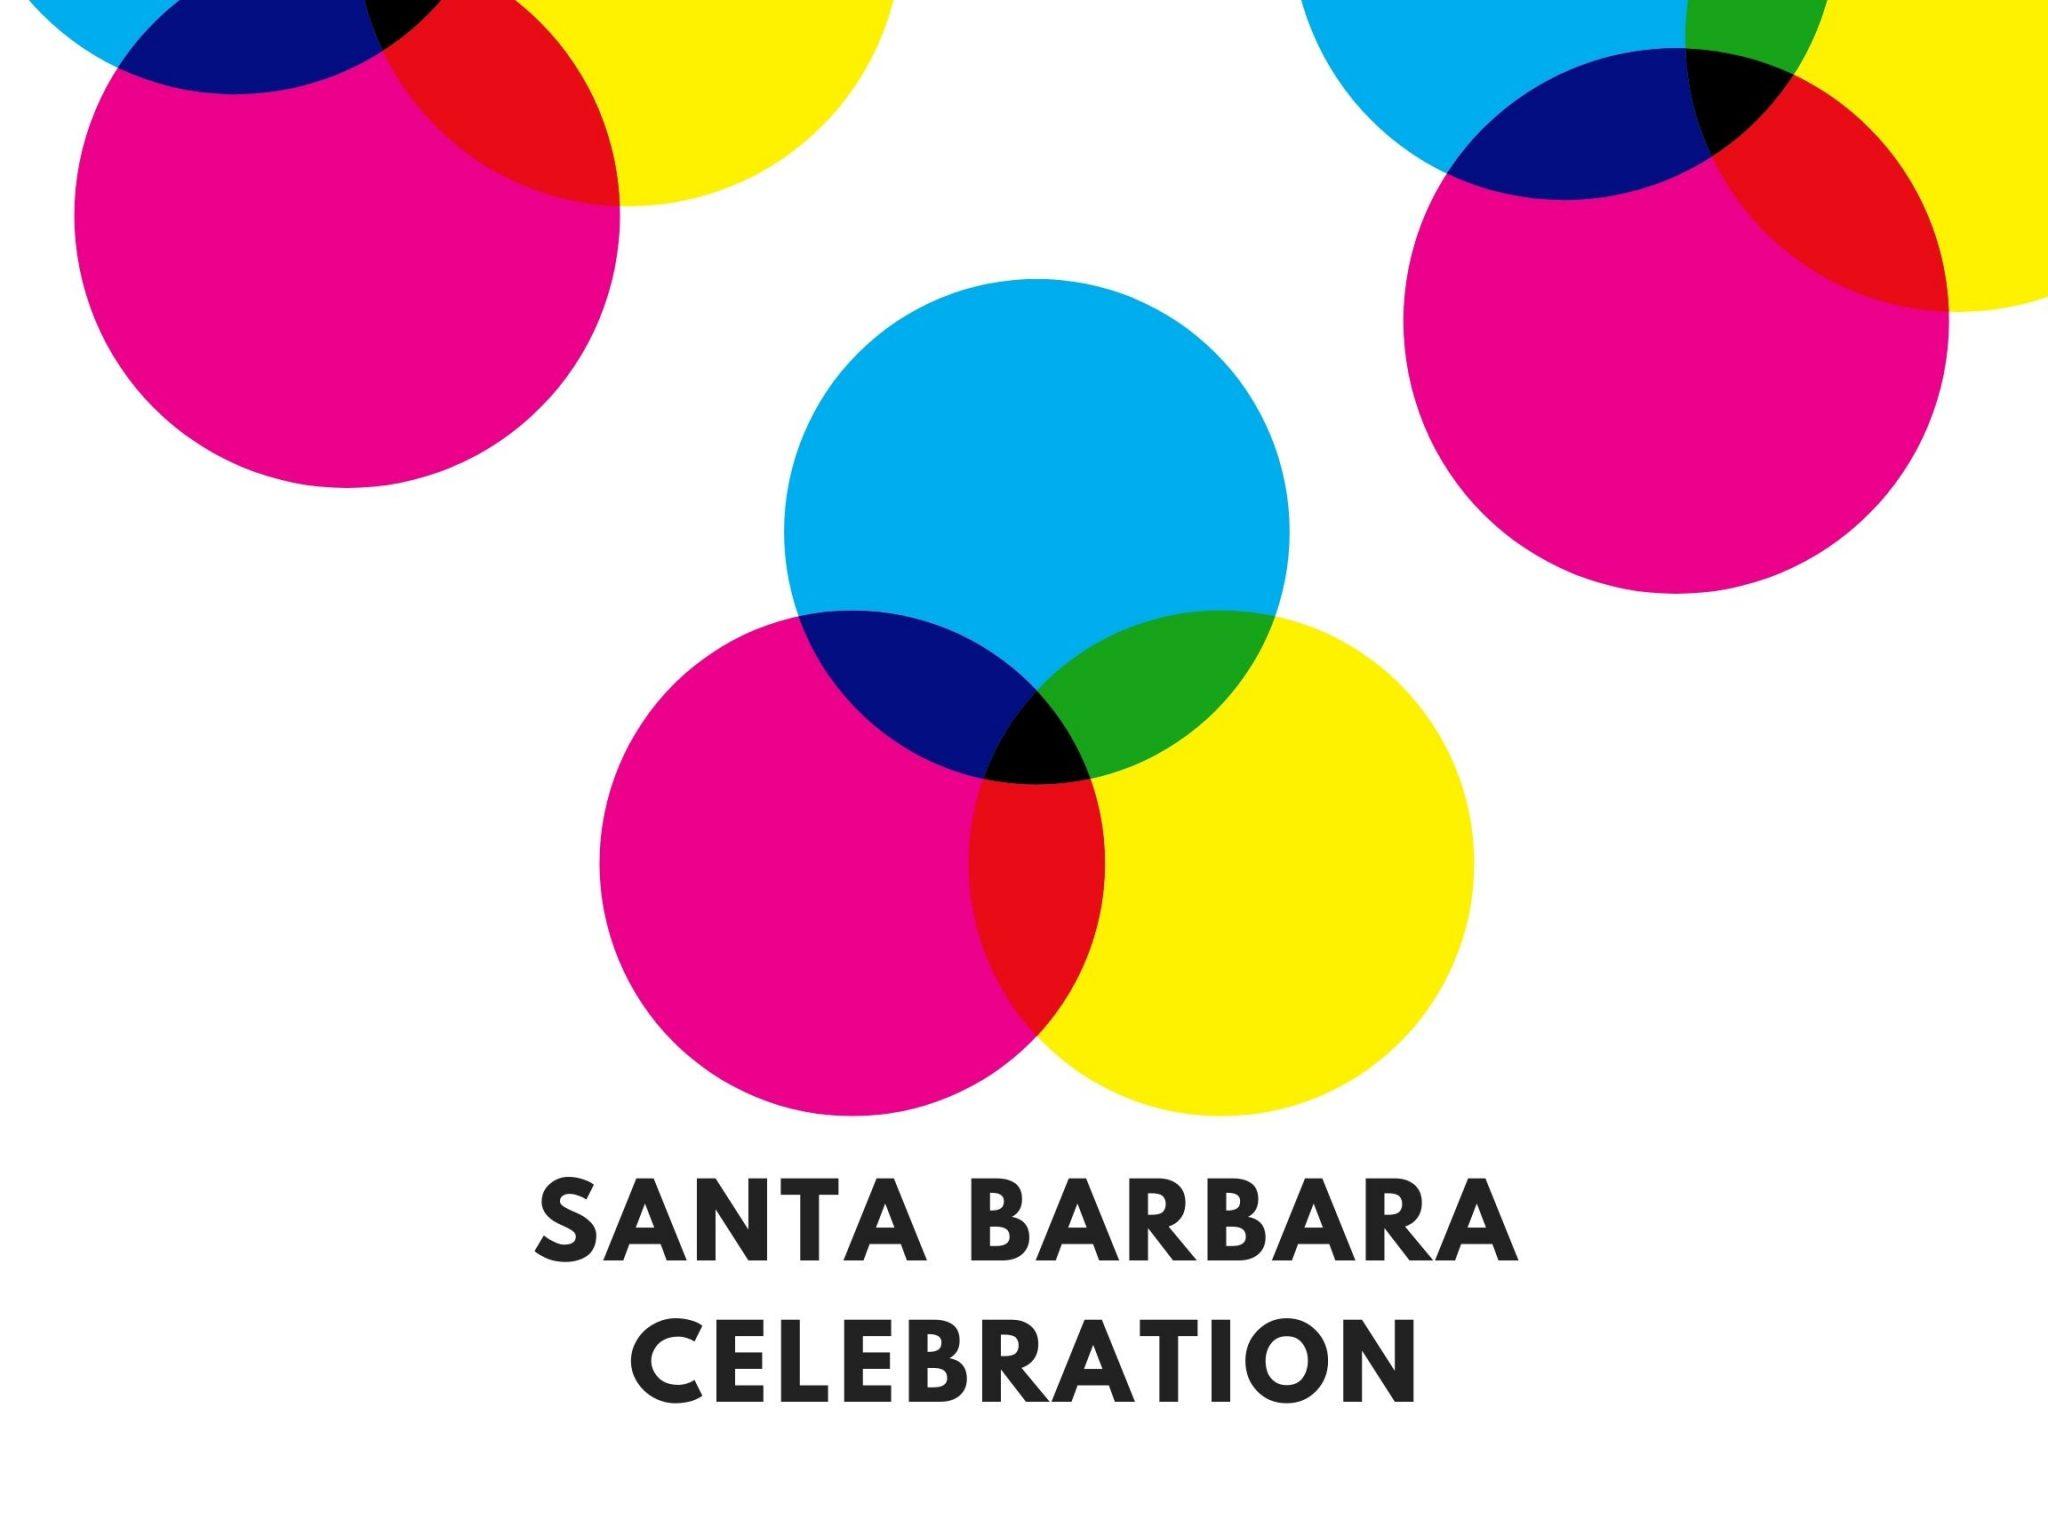 Santa Barbara Celebration